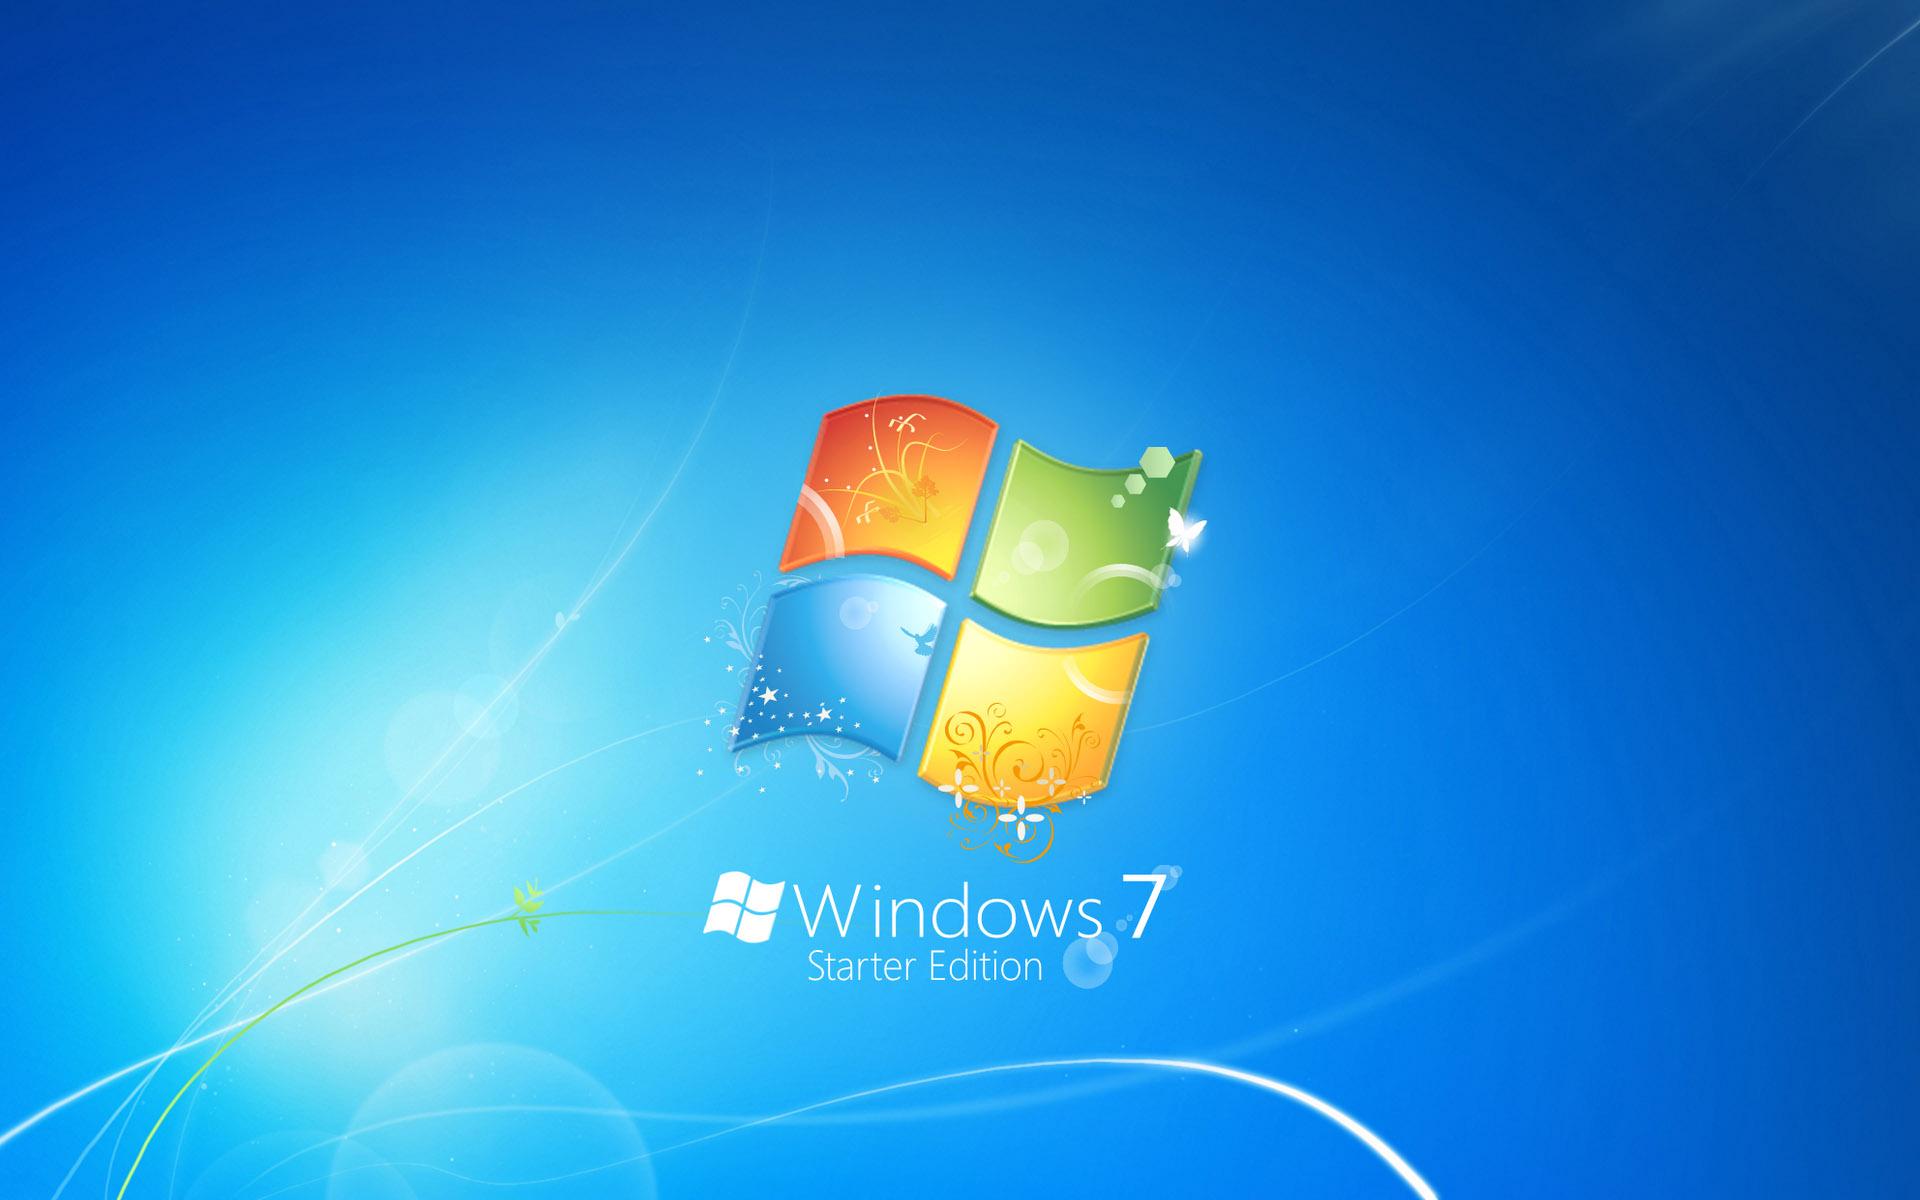 Windows 7 desktop wallpaper hd